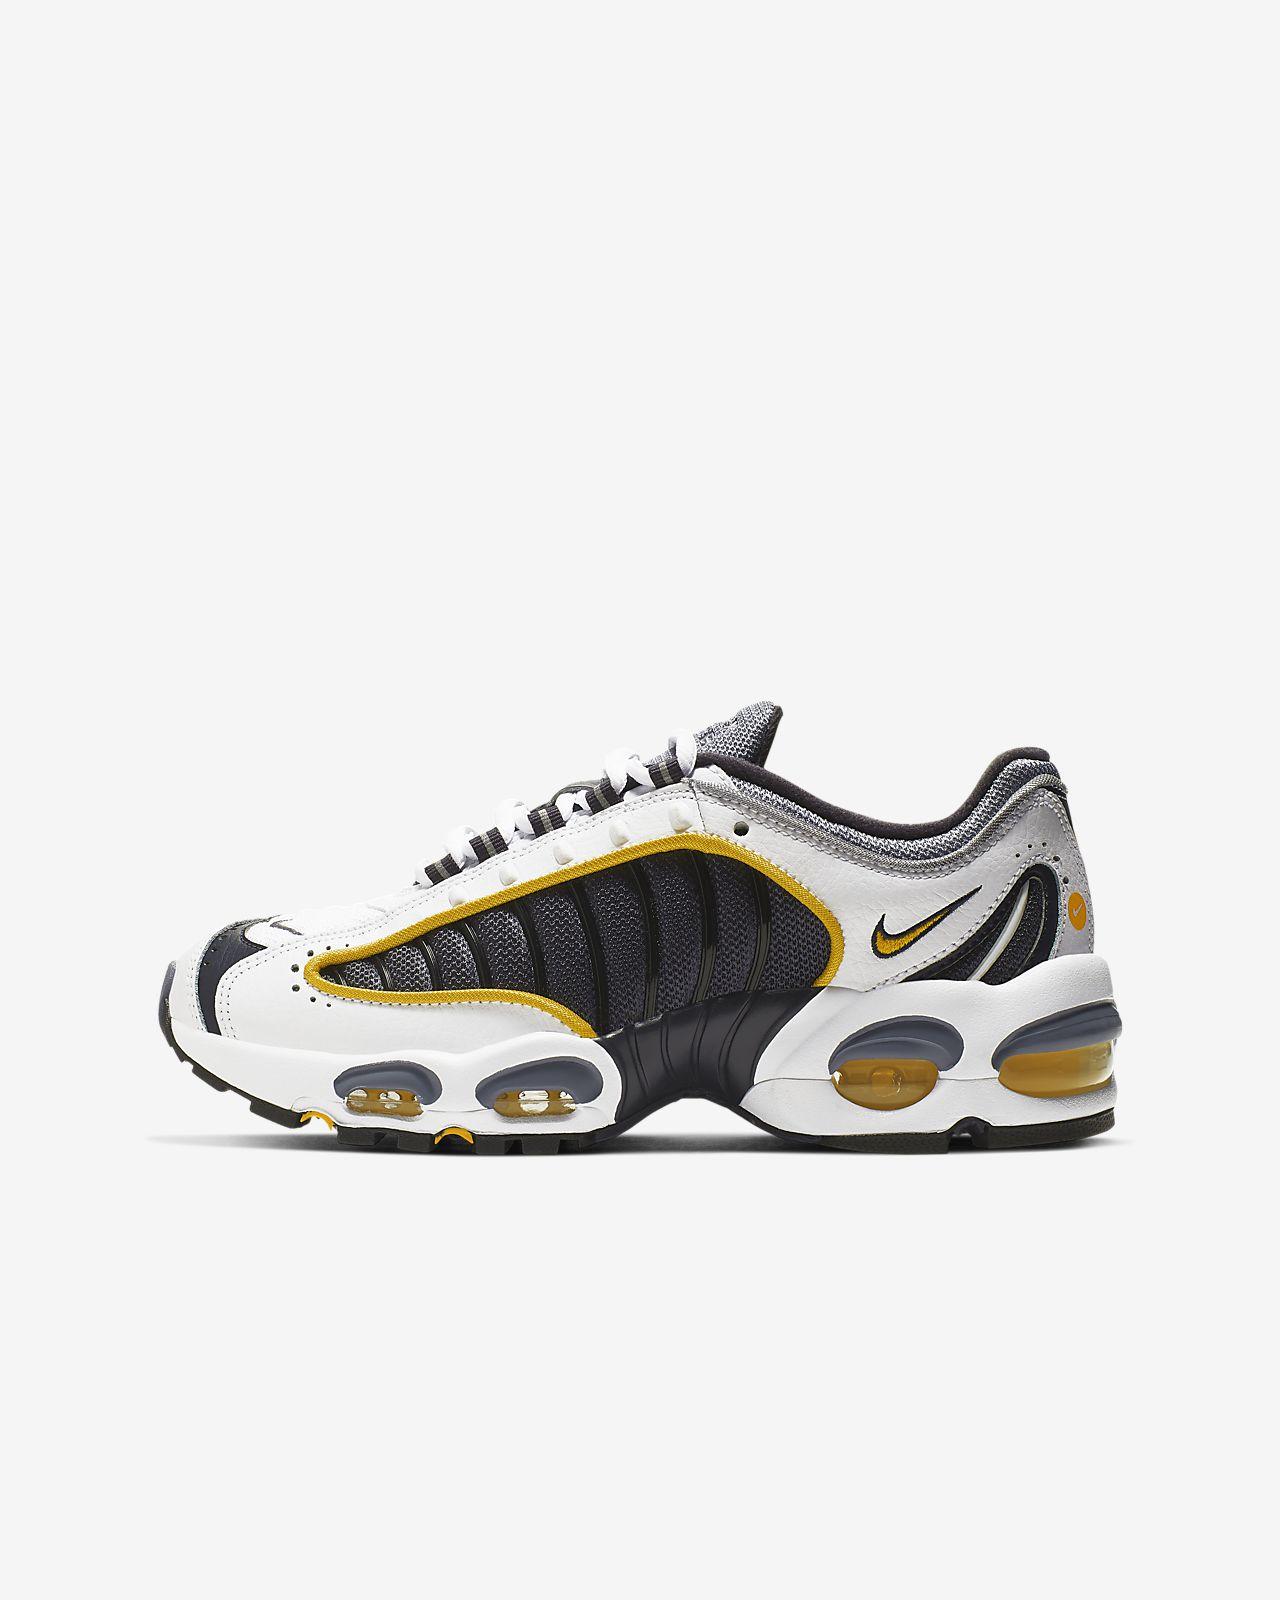 Nike Air Max Tailwind IV Big Kids' Shoe